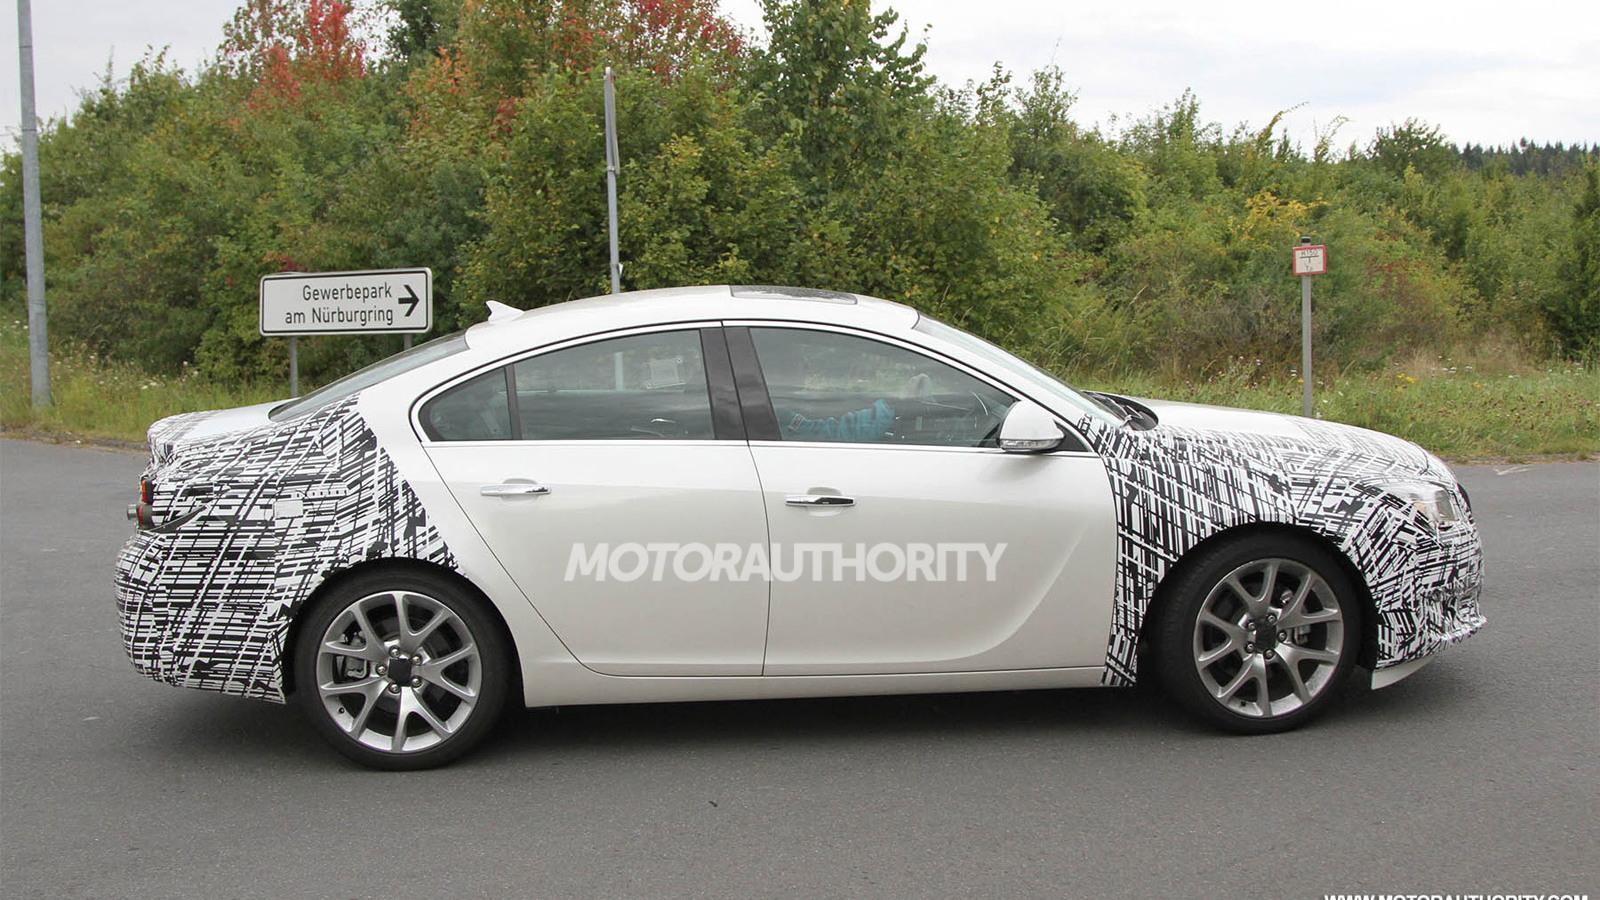 2014 Buick Regal facelift spy shots